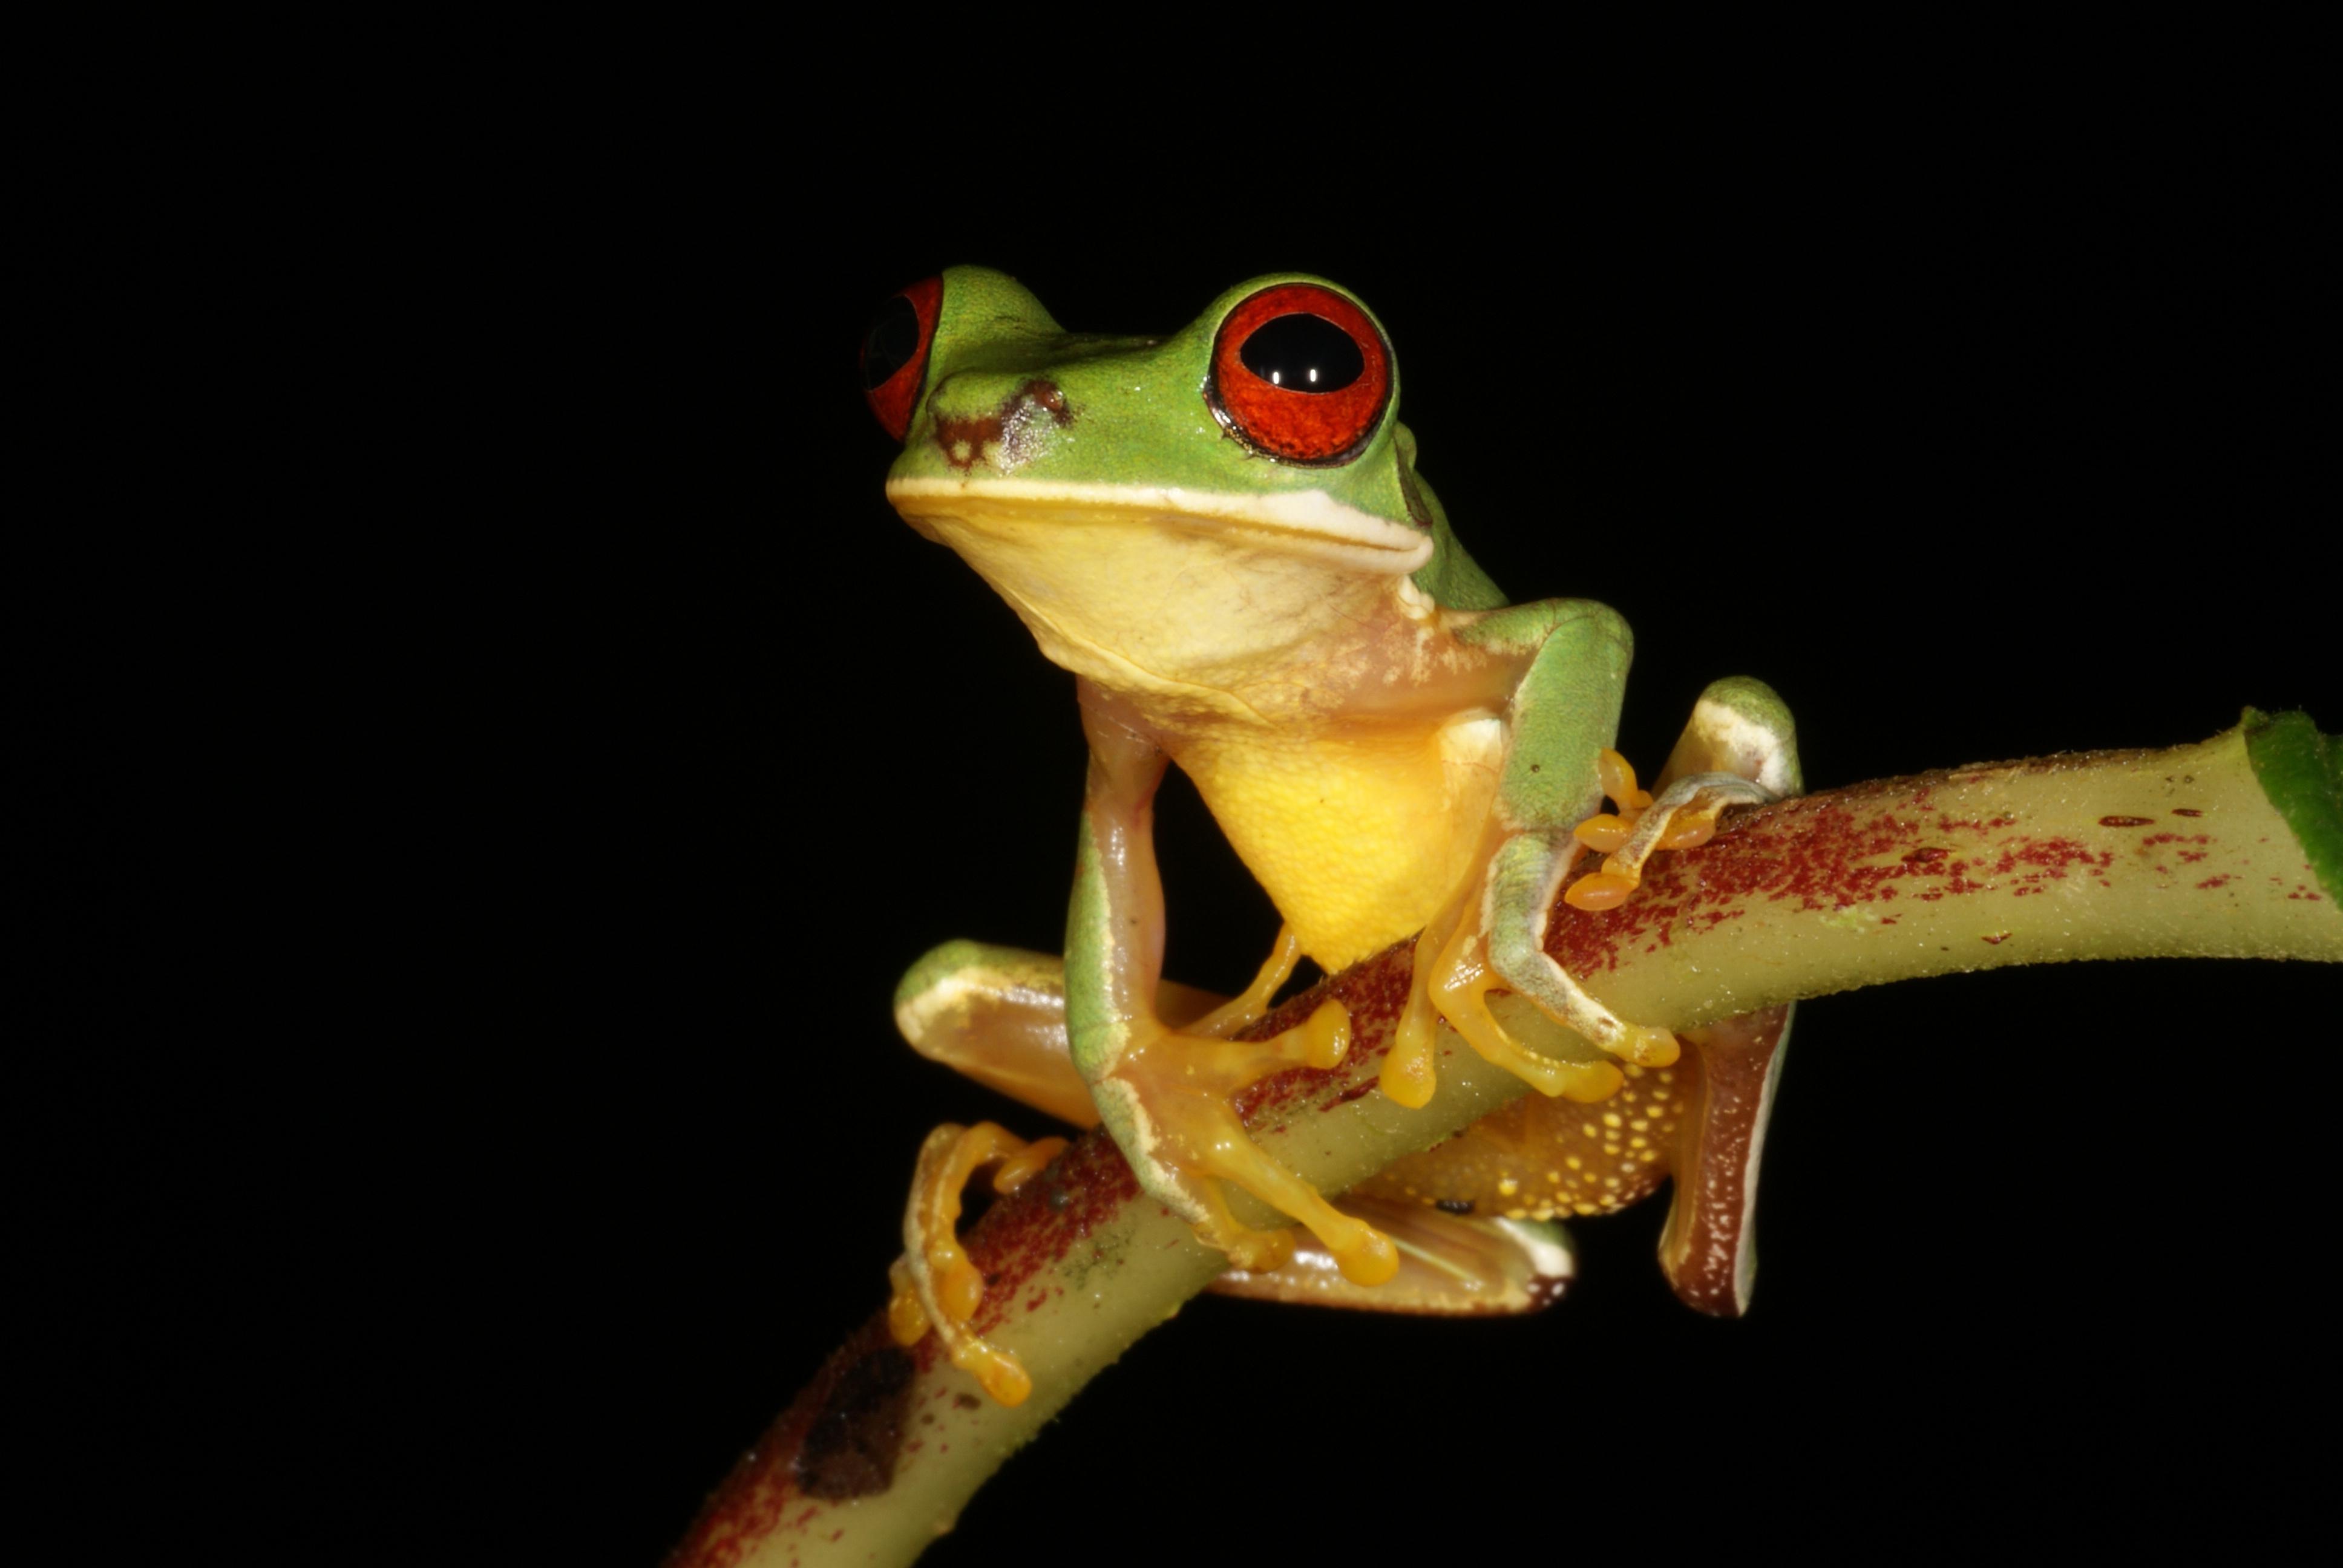 Red-eyed stream frog (Duellmanohyla uranochroa)